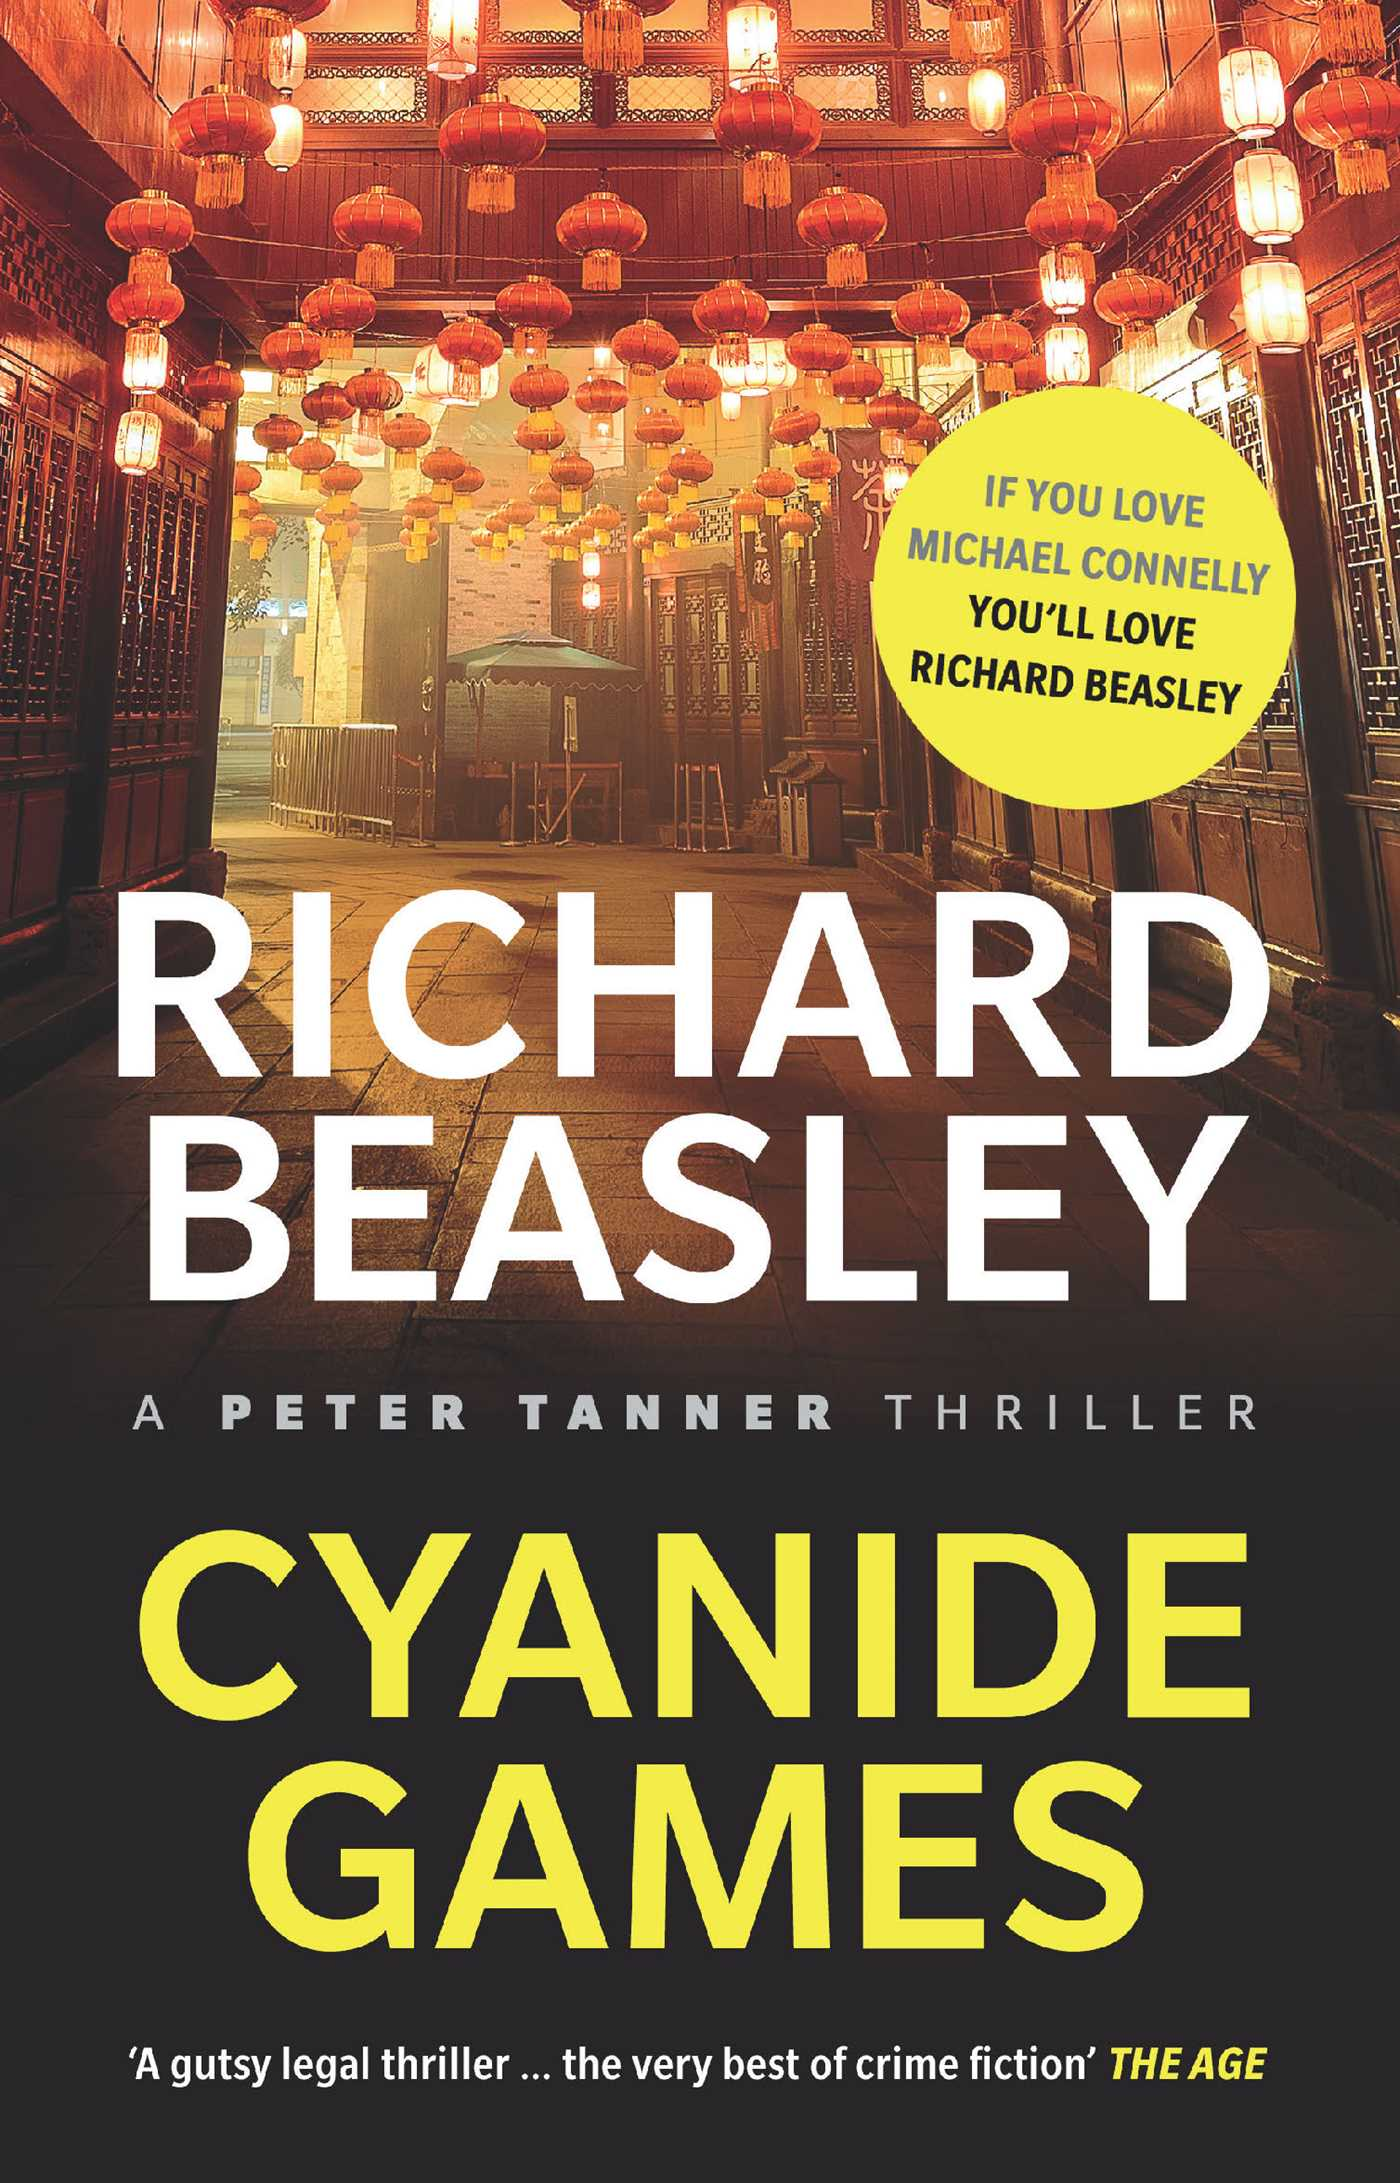 Cyanide games a peter tanner thriller 9781925533491 hr